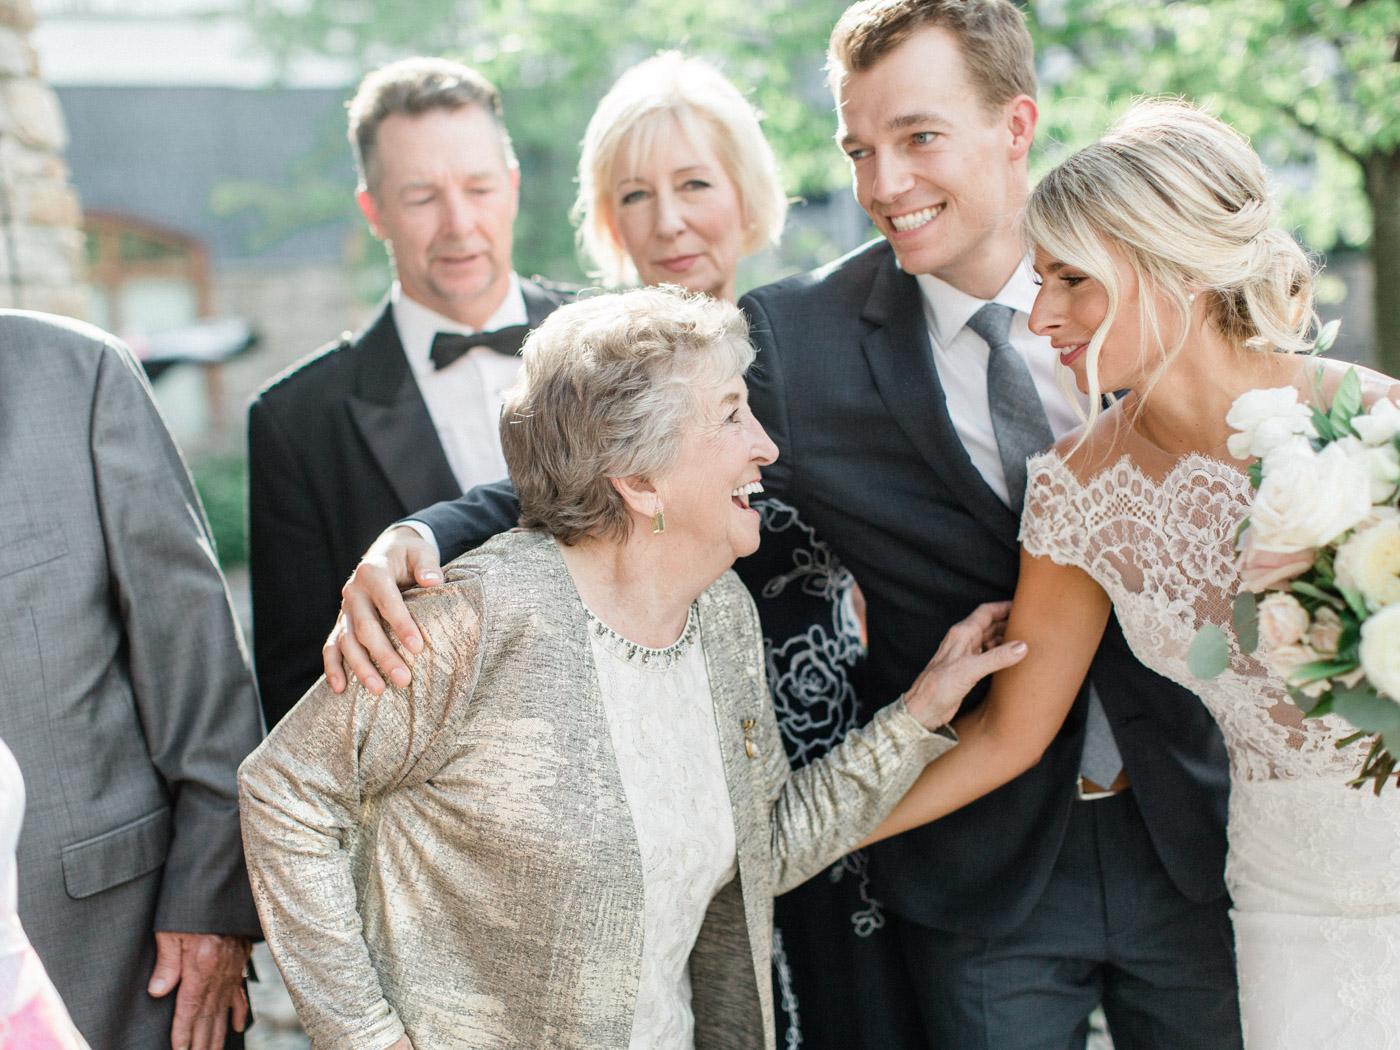 Toronto-Muskoka-wedding-photographer-summery-fun-documentary-the-marriott-rosseau95.jpg